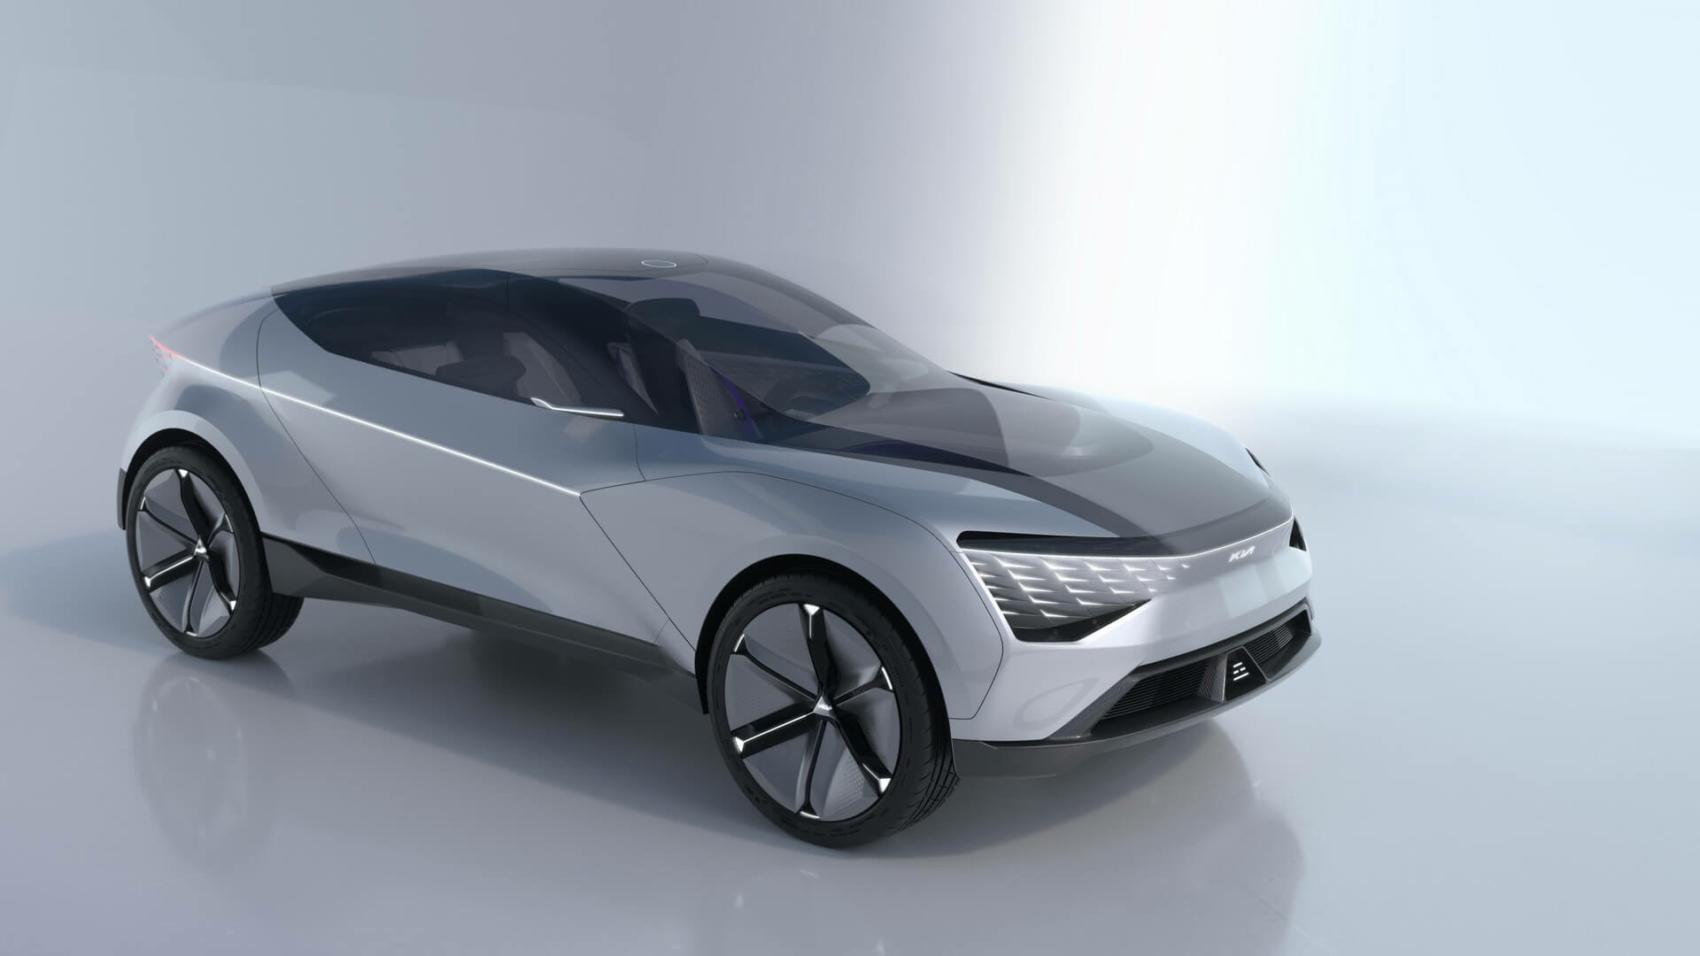 2019 Kia Futuron concept